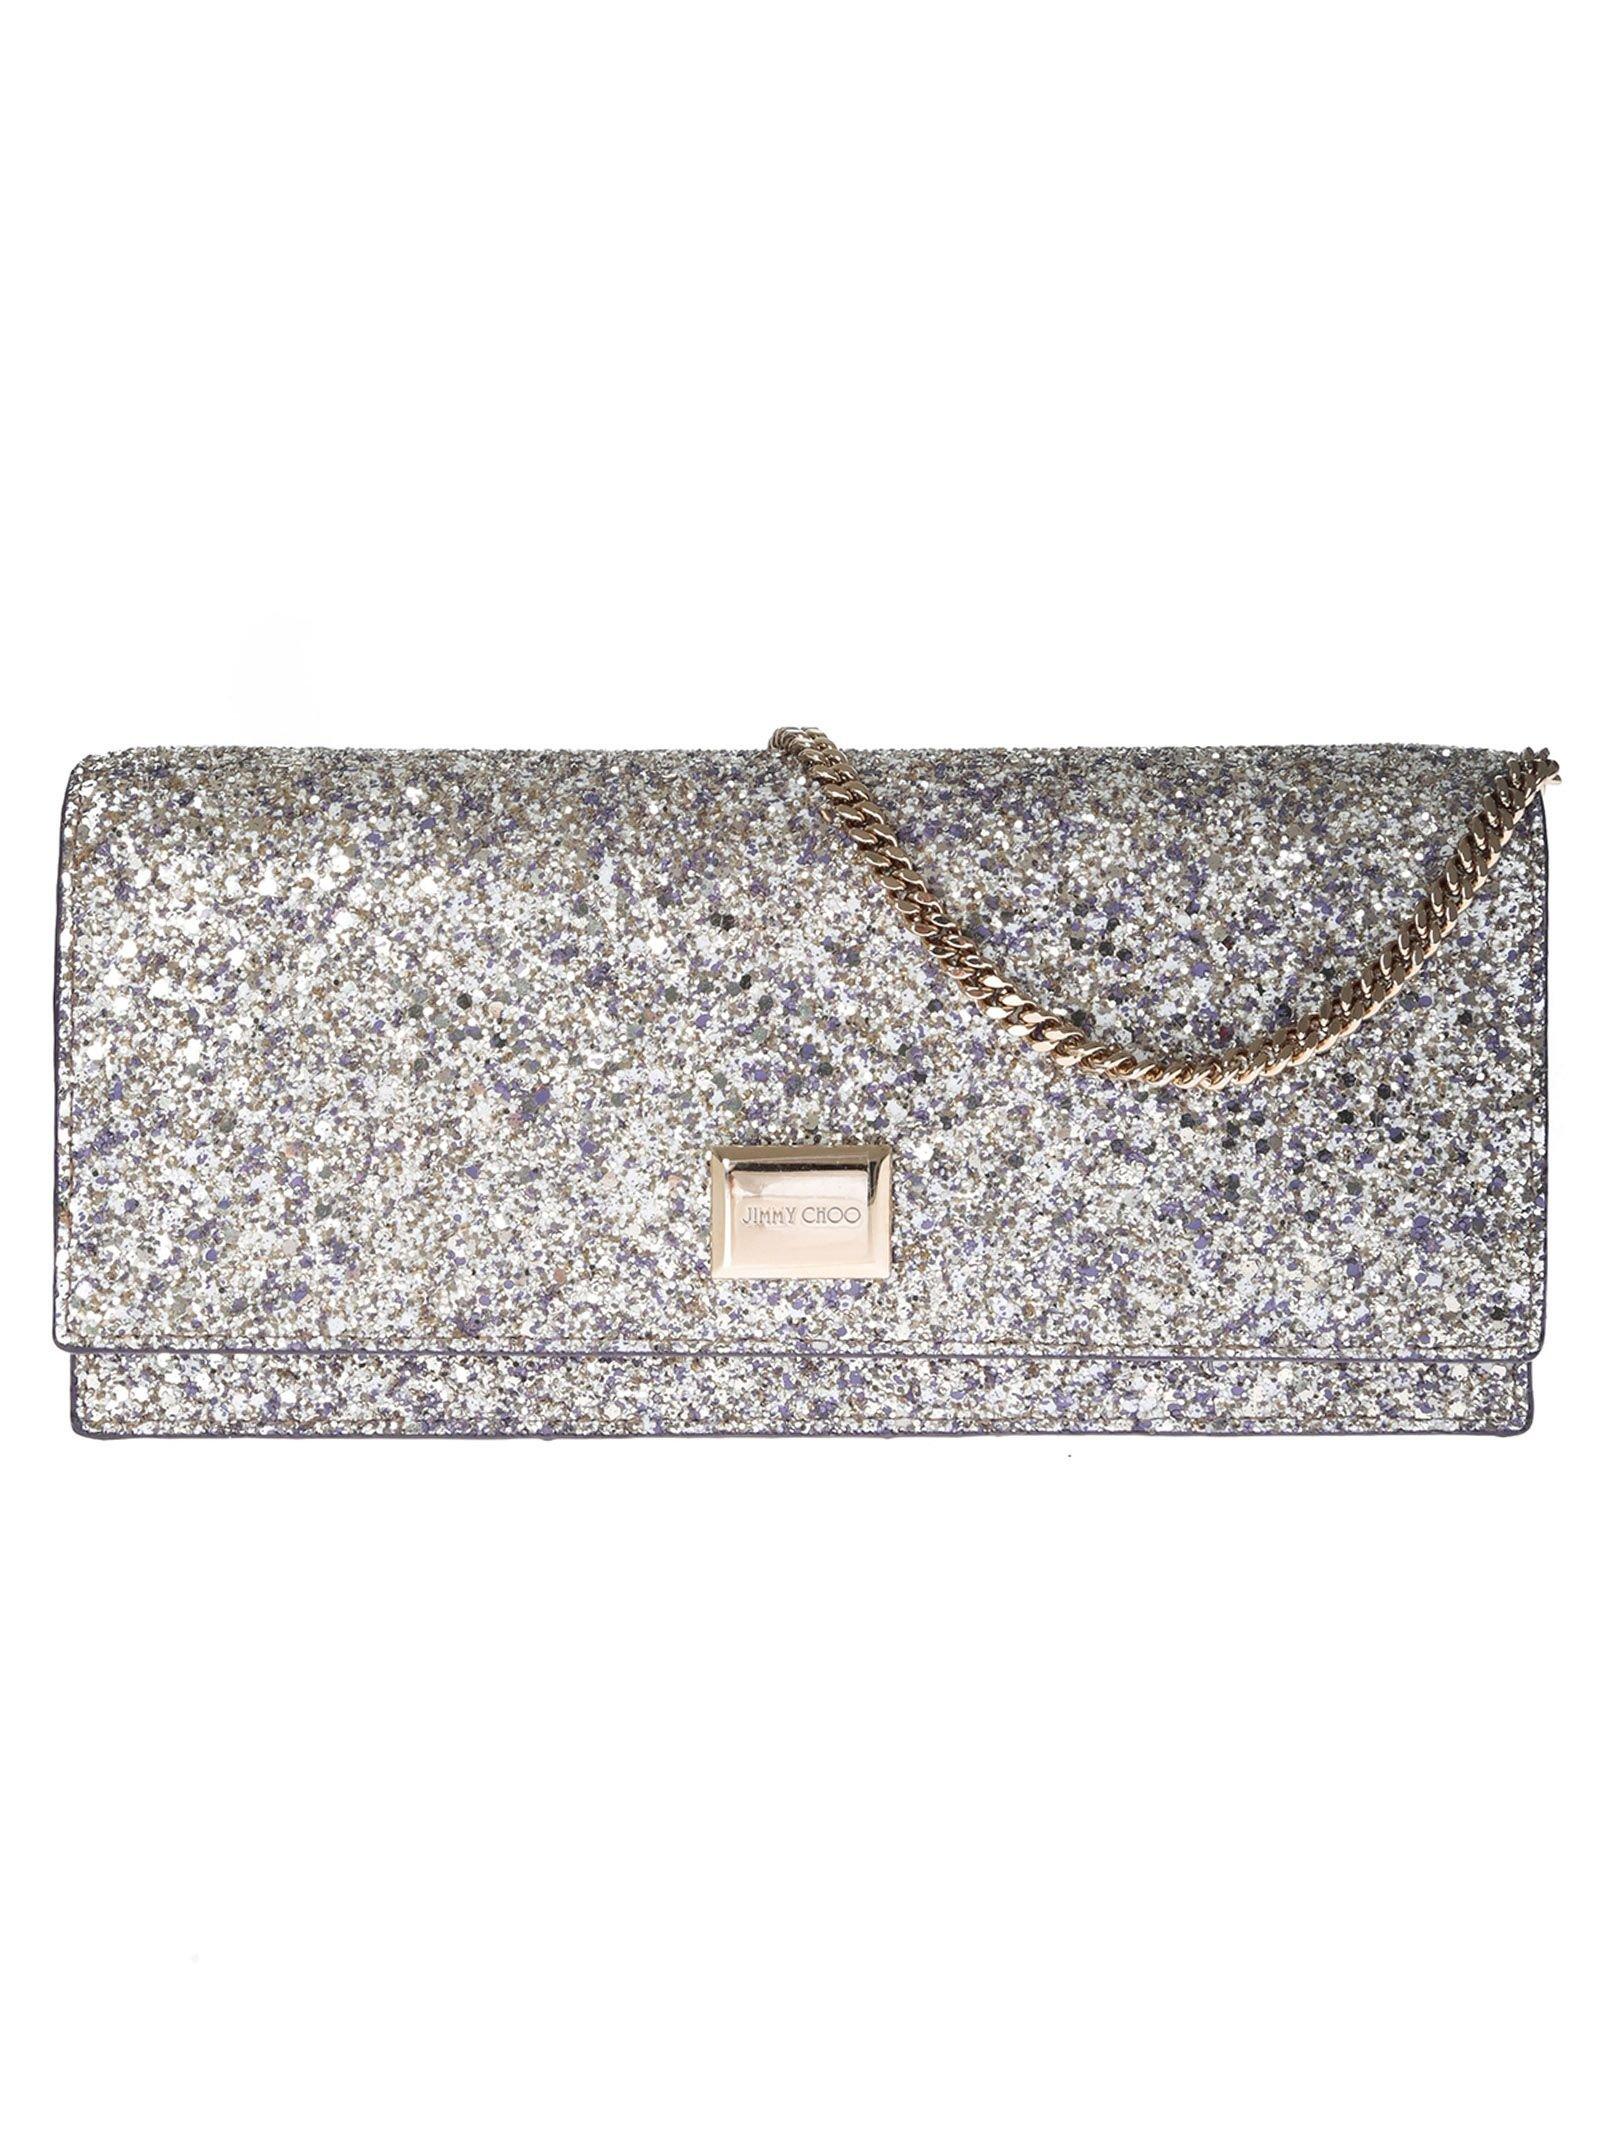 Jimmy Choo Lilia Shoulder Bag